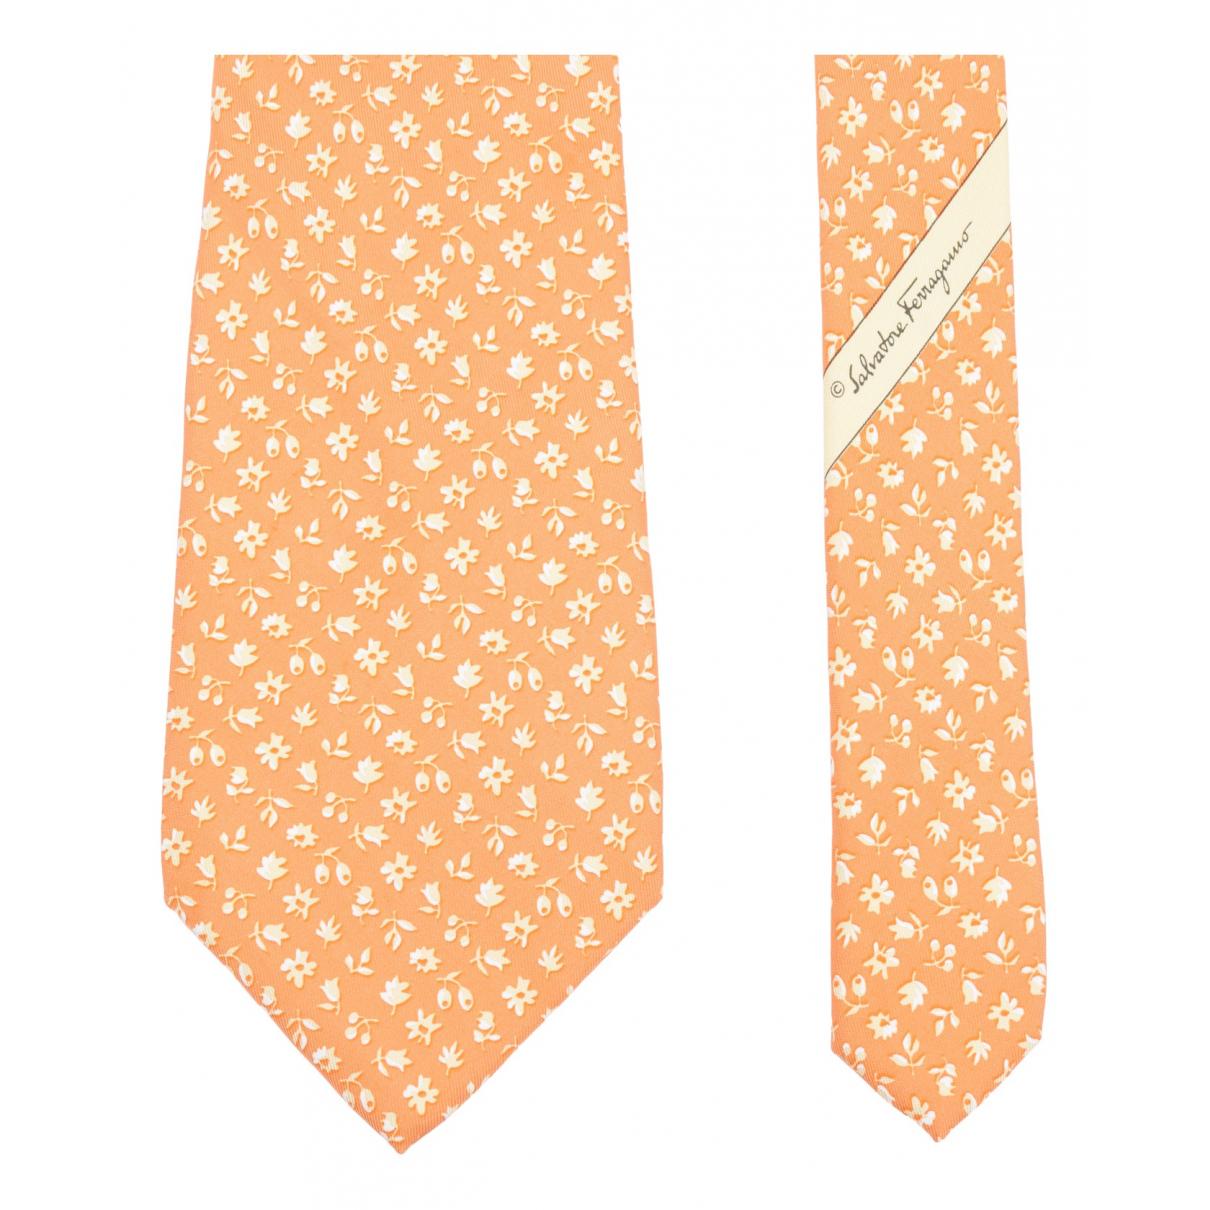 Salvatore Ferragamo N Orange Silk Ties for Men N